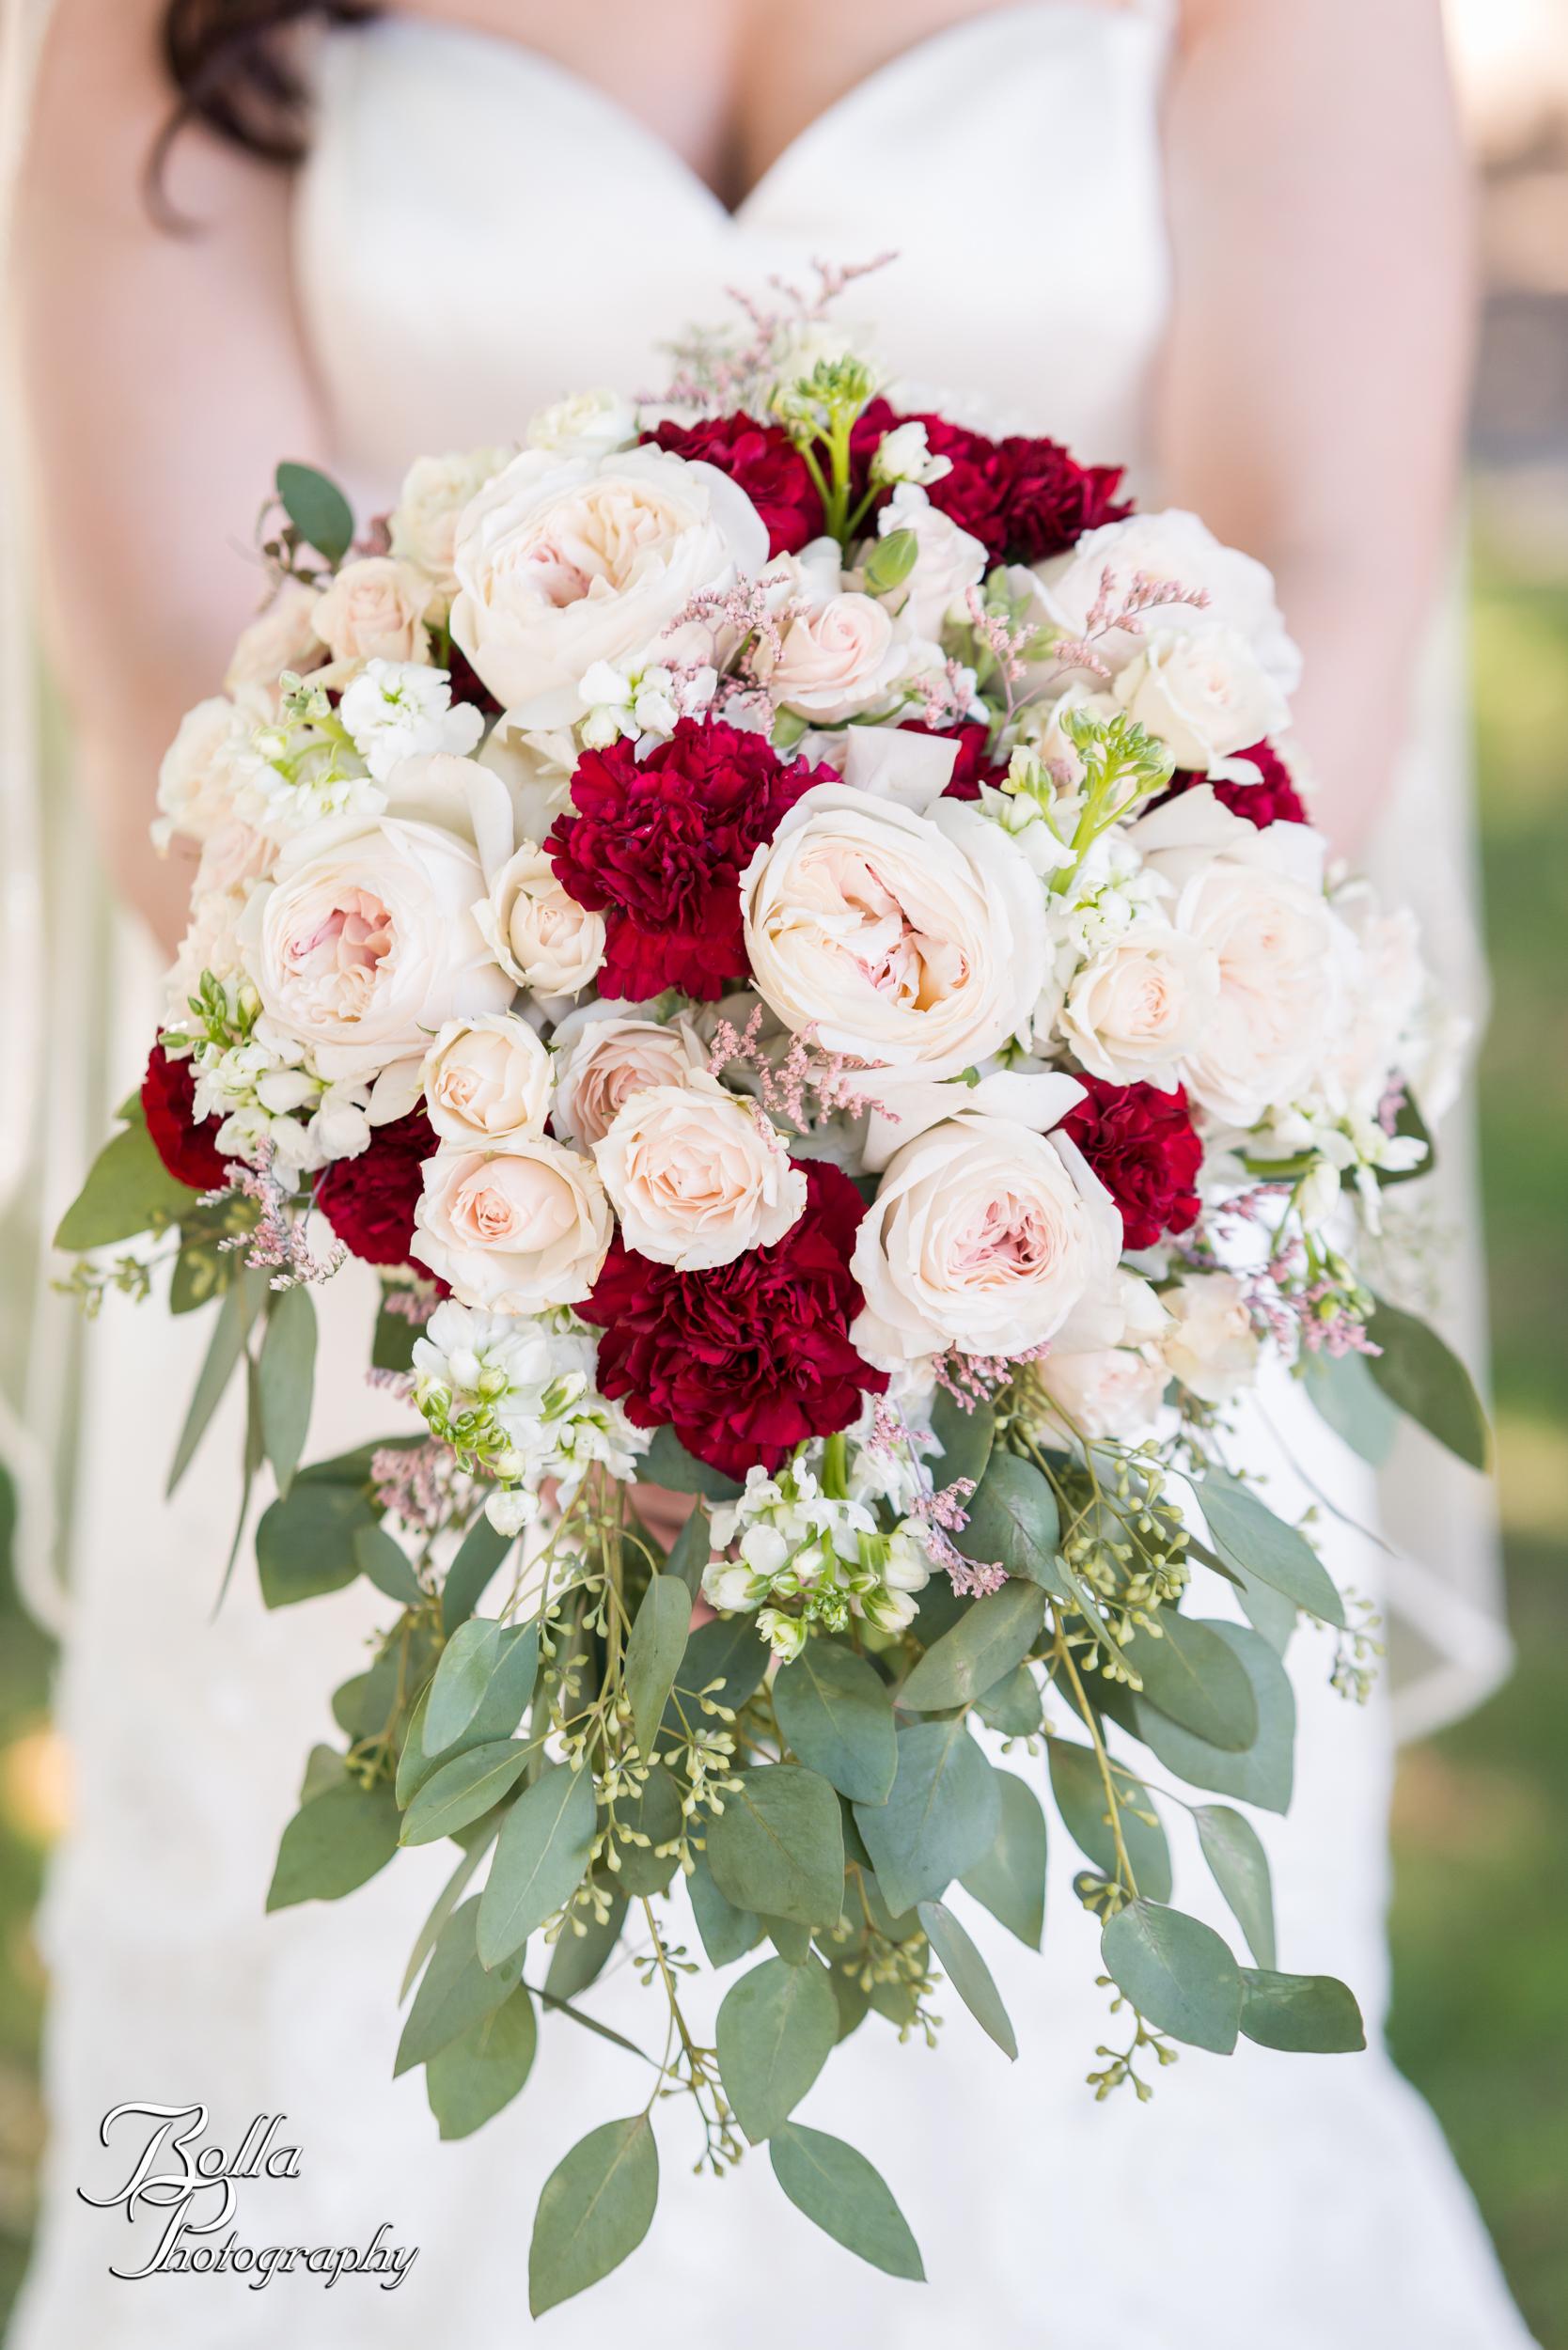 Bolla_photography_edwardsville_wedding_photographer_st_louis_weddings_Reilmann-0298.jpg